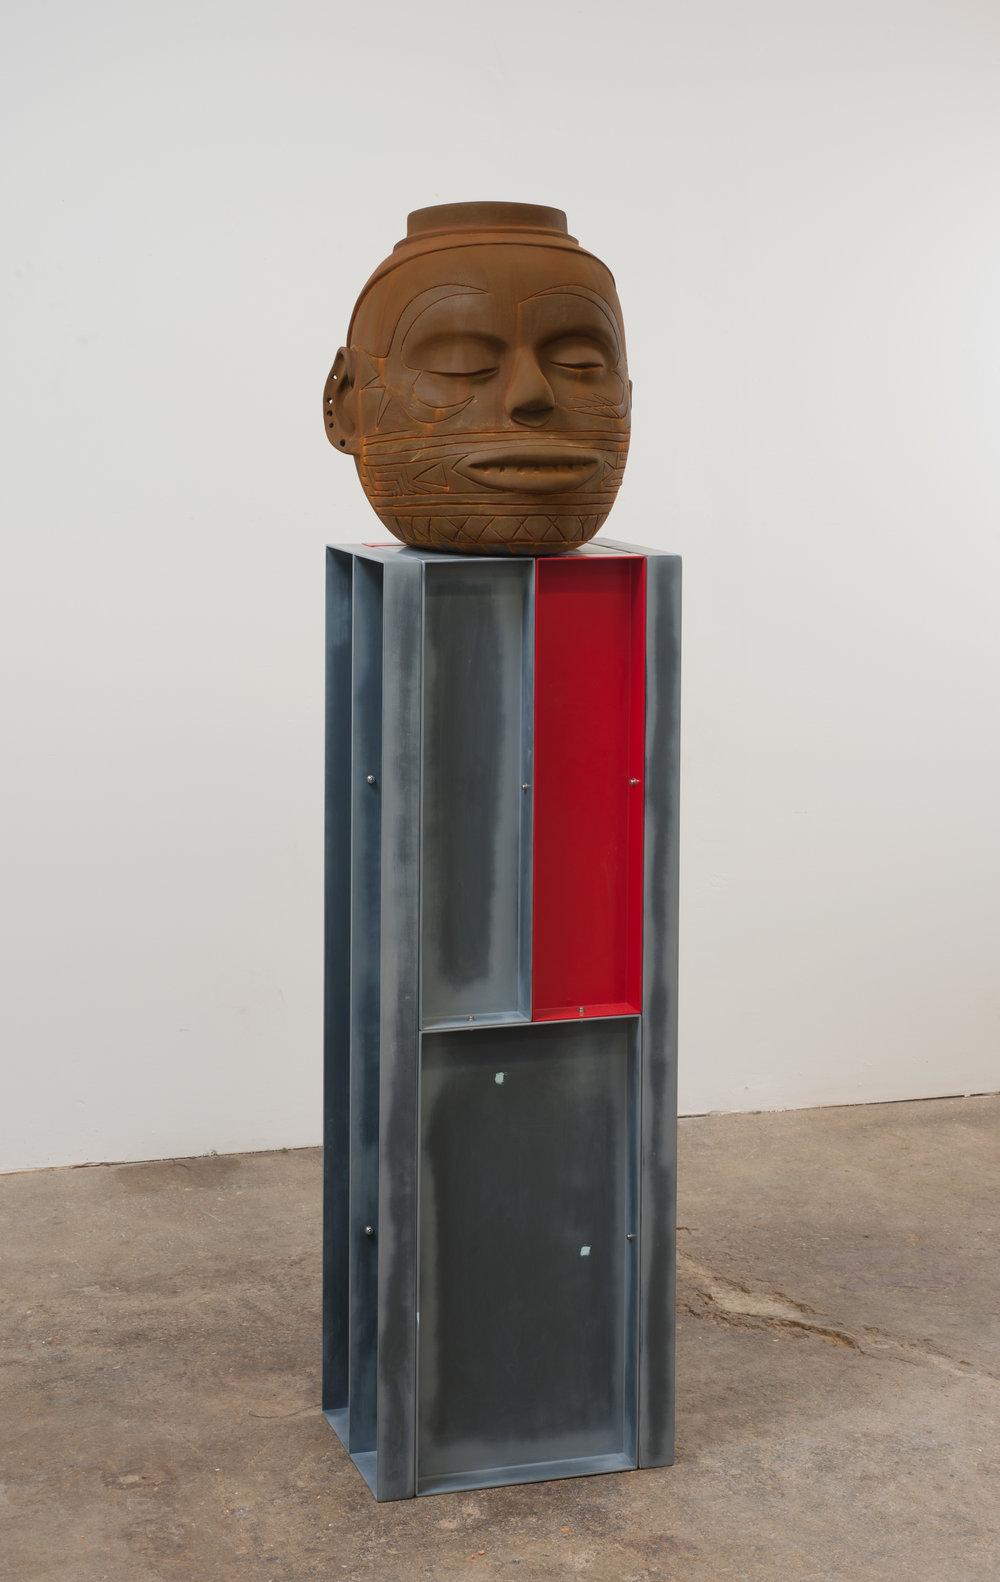 400% (Death Grin/Klee Face), 2010 terracotta, aluminum, paint 175 x 40 x 30 cm - 68 7/8 x 15 3/4 x 11 3/4 inches